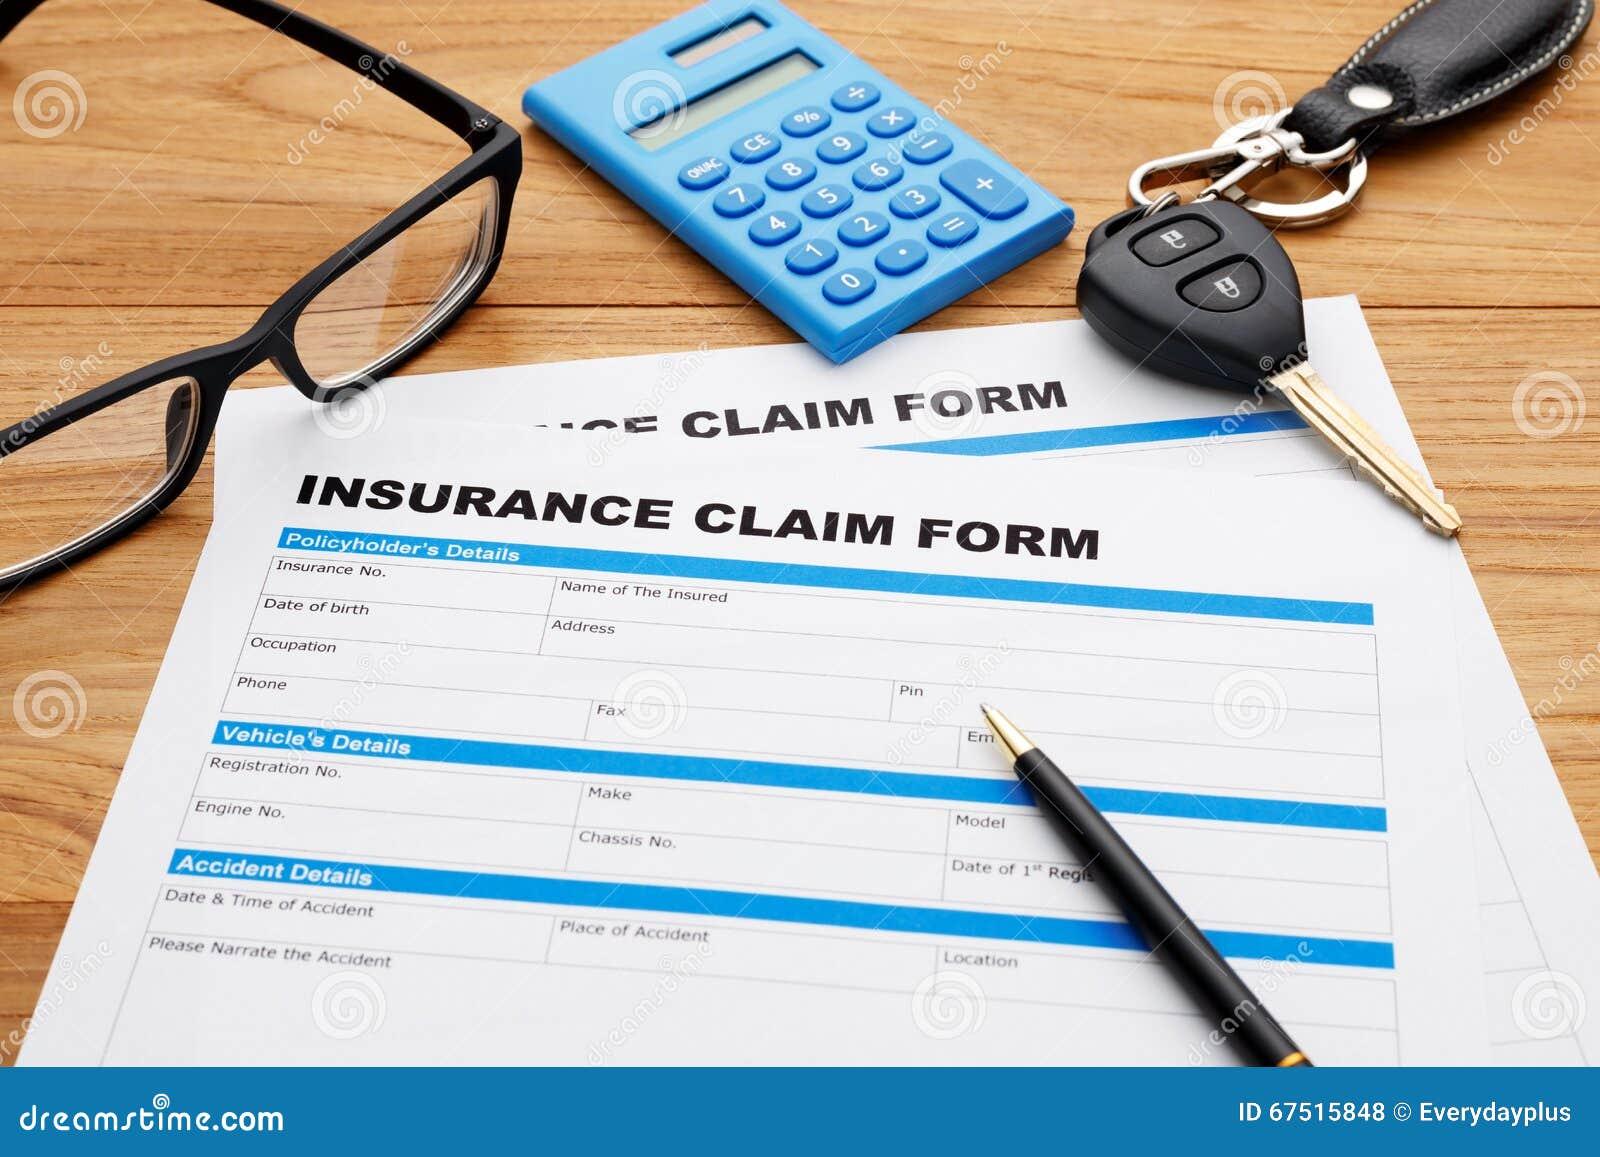 Insurance Claim Form With Car Key Stock Photo - Image of ...